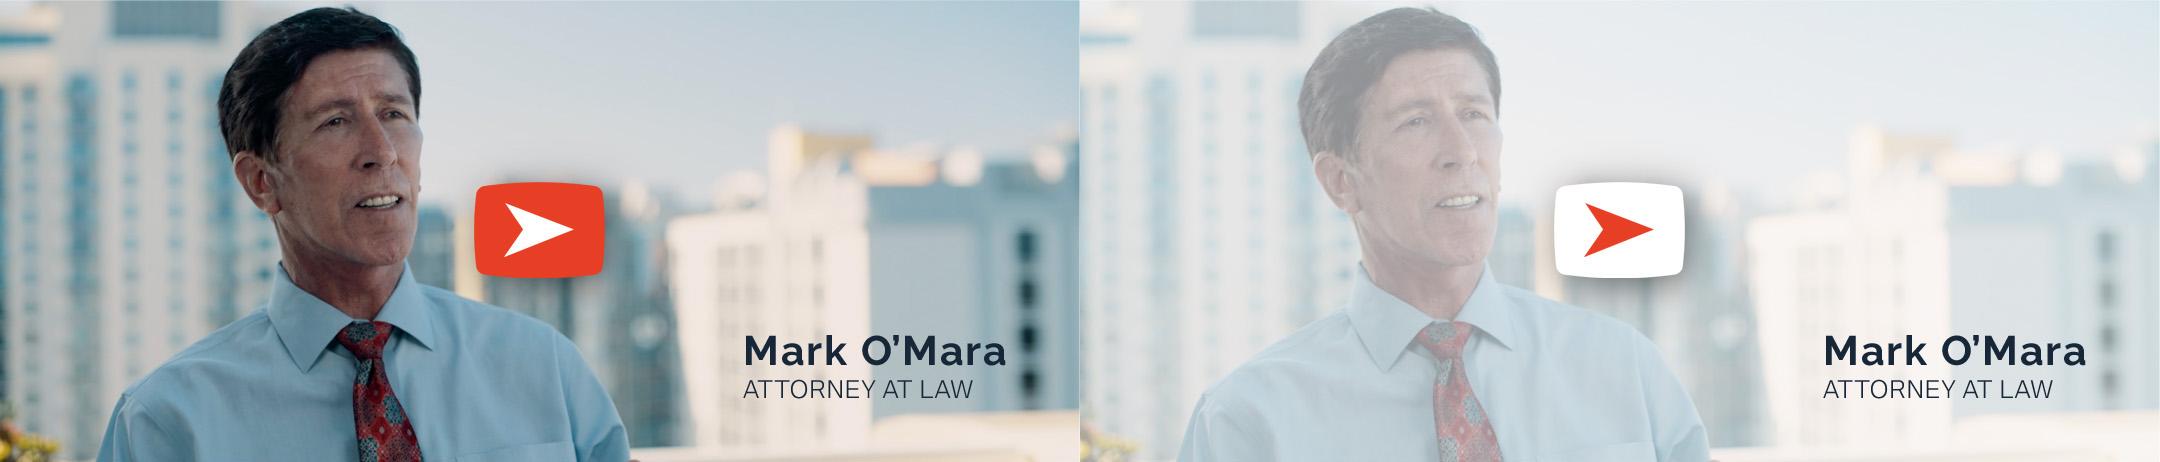 Omara Testimonial Video